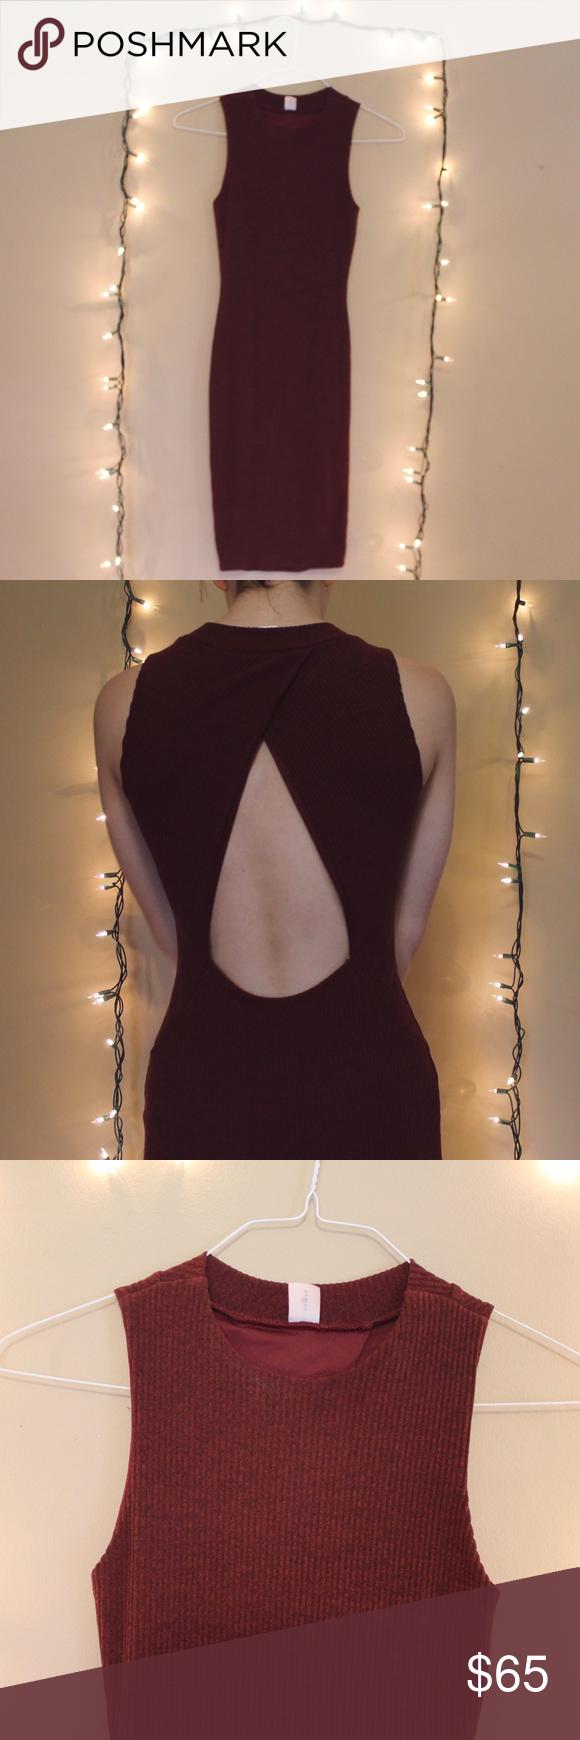 Red form fitting long dress | Smoke free, Rust and Smoking